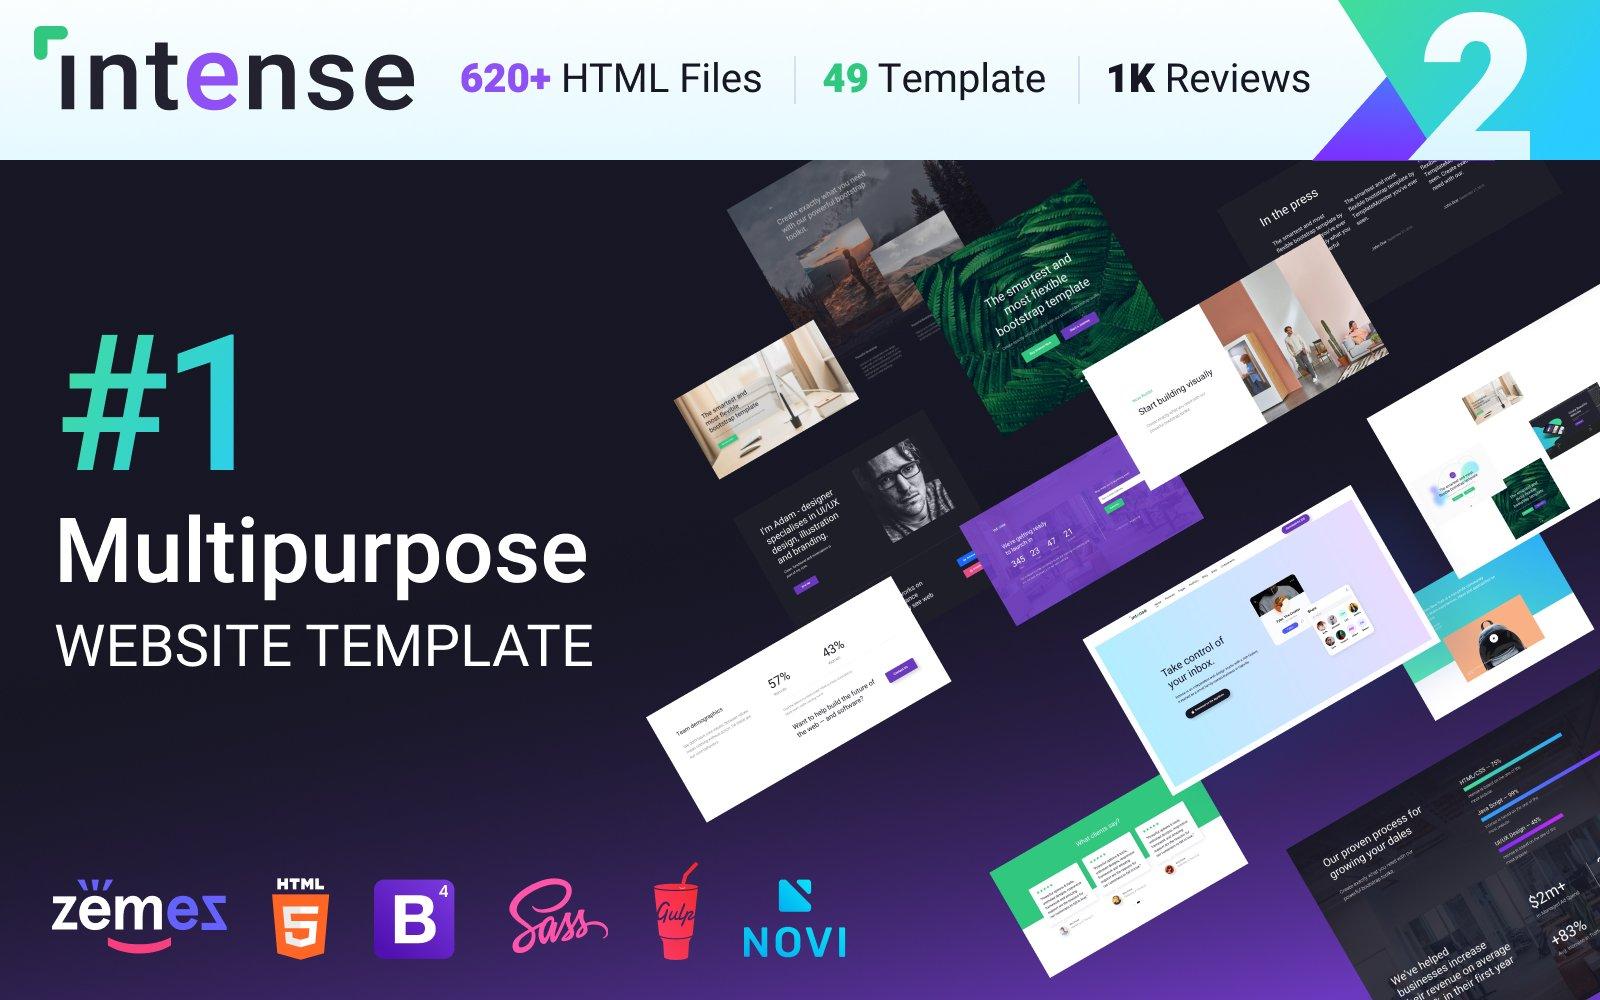 """Multipurpose Website Template Intense - #1 HTML Bootstrap"" 响应式网页模板 #58888 - 截图"